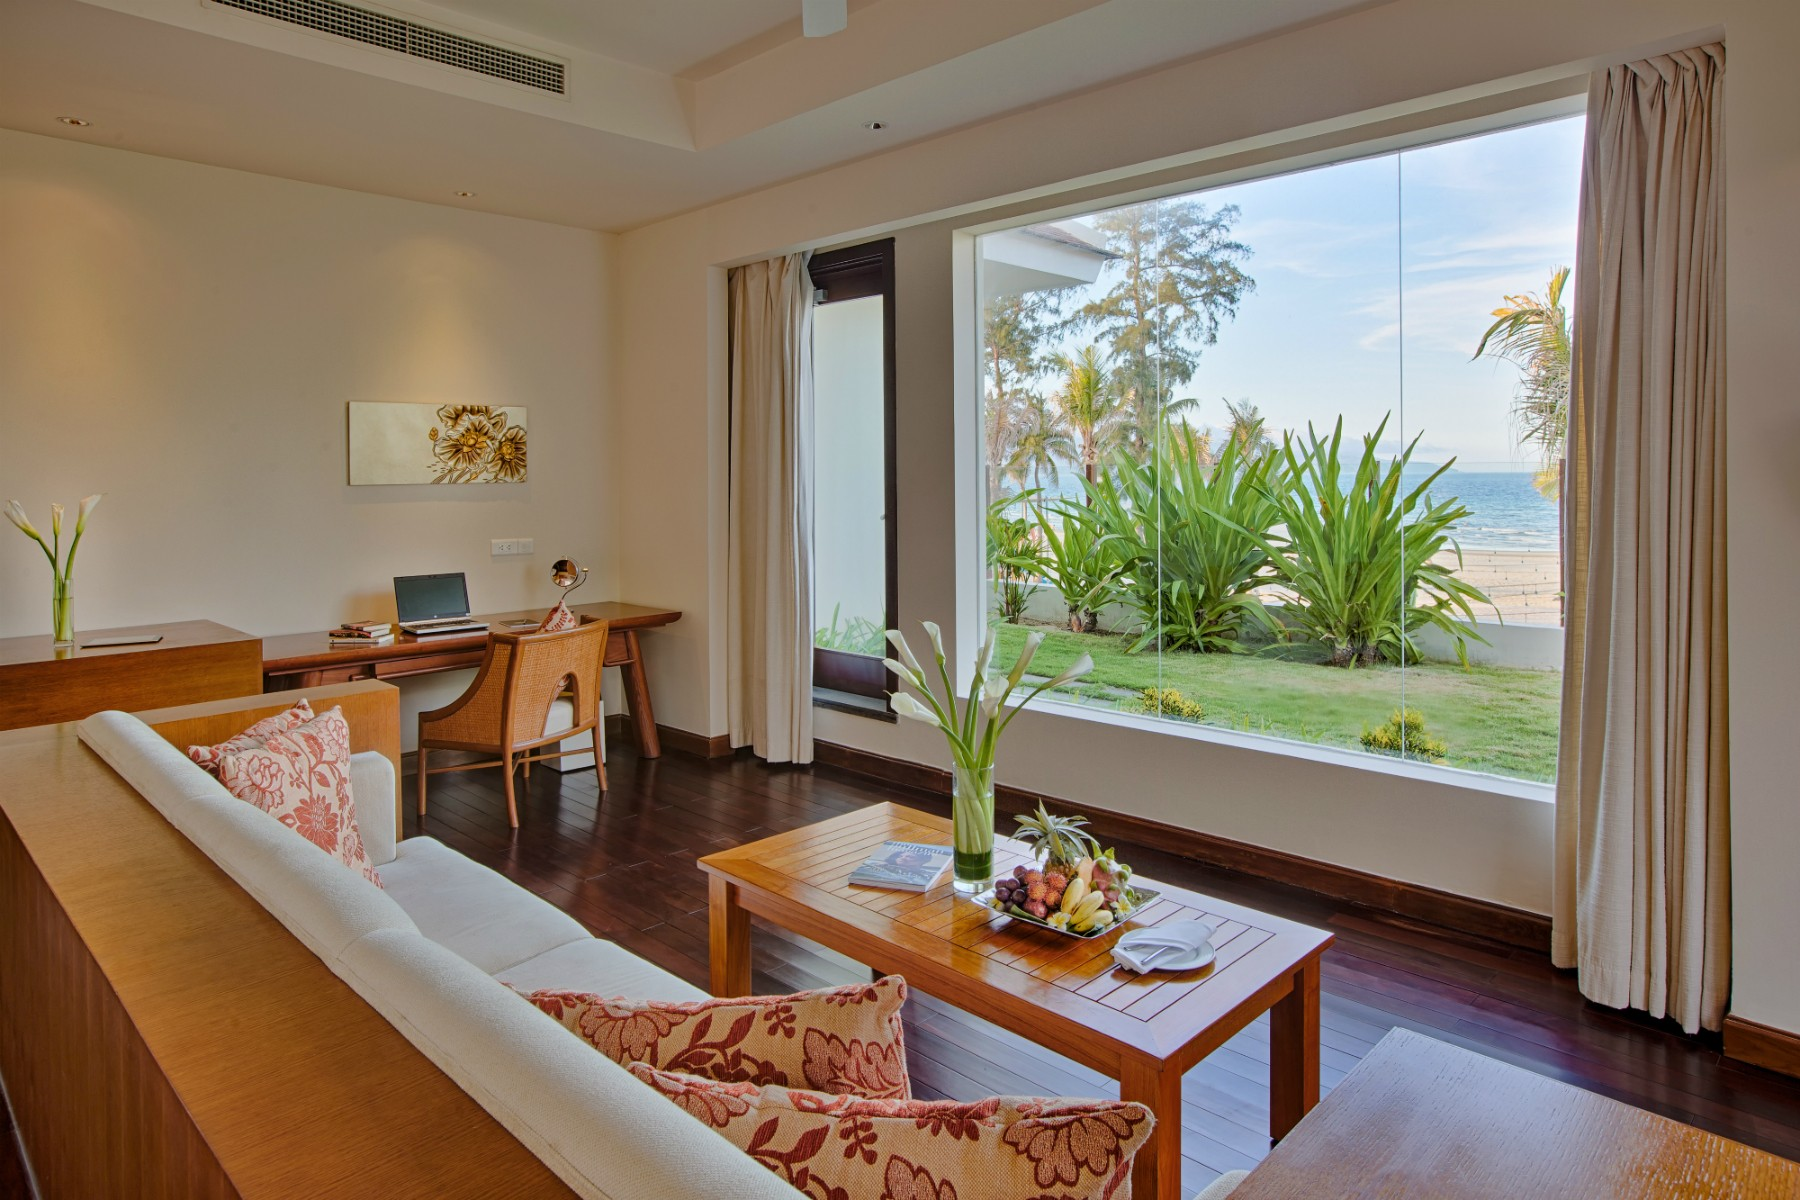 Pullman danang beach resort two bedroom cottage 5 star - 2 bedroom hotels in virginia beach ...